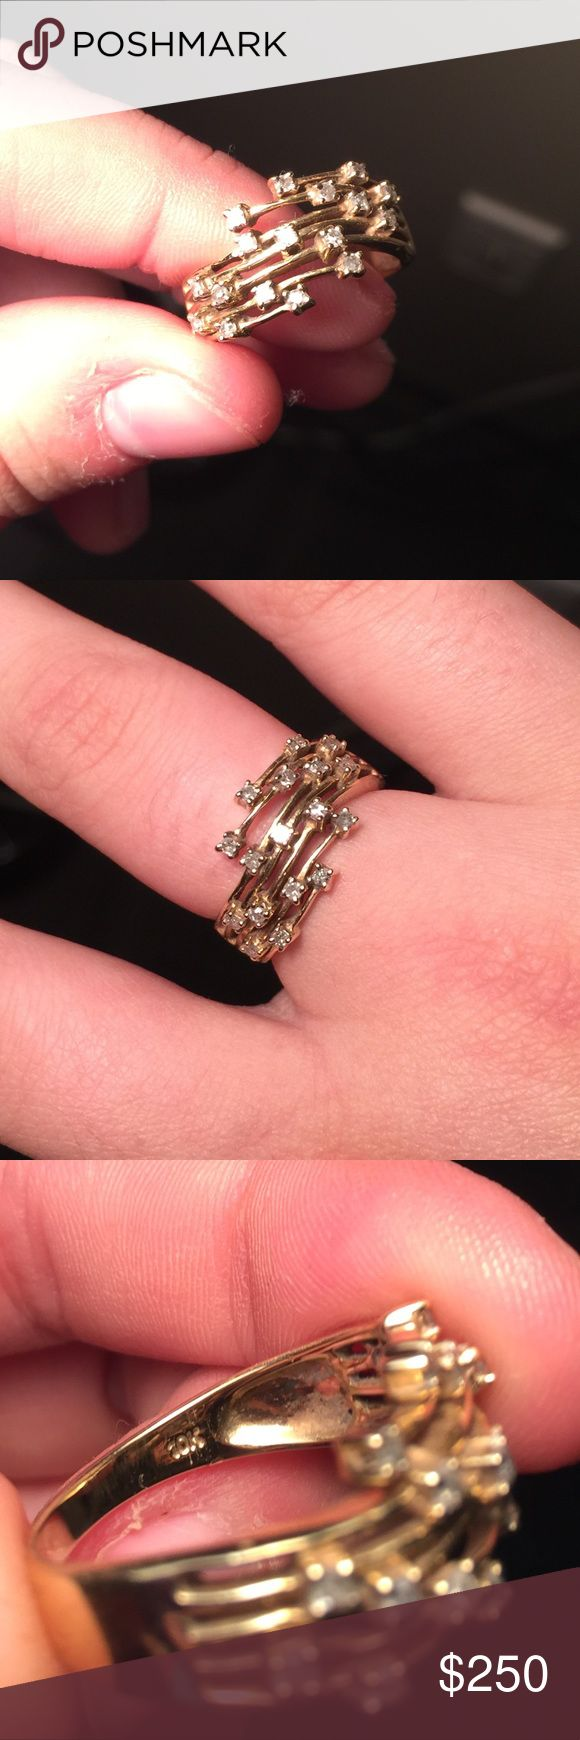 1726 best Rings that Rock images on Pinterest | Diamond rings ...